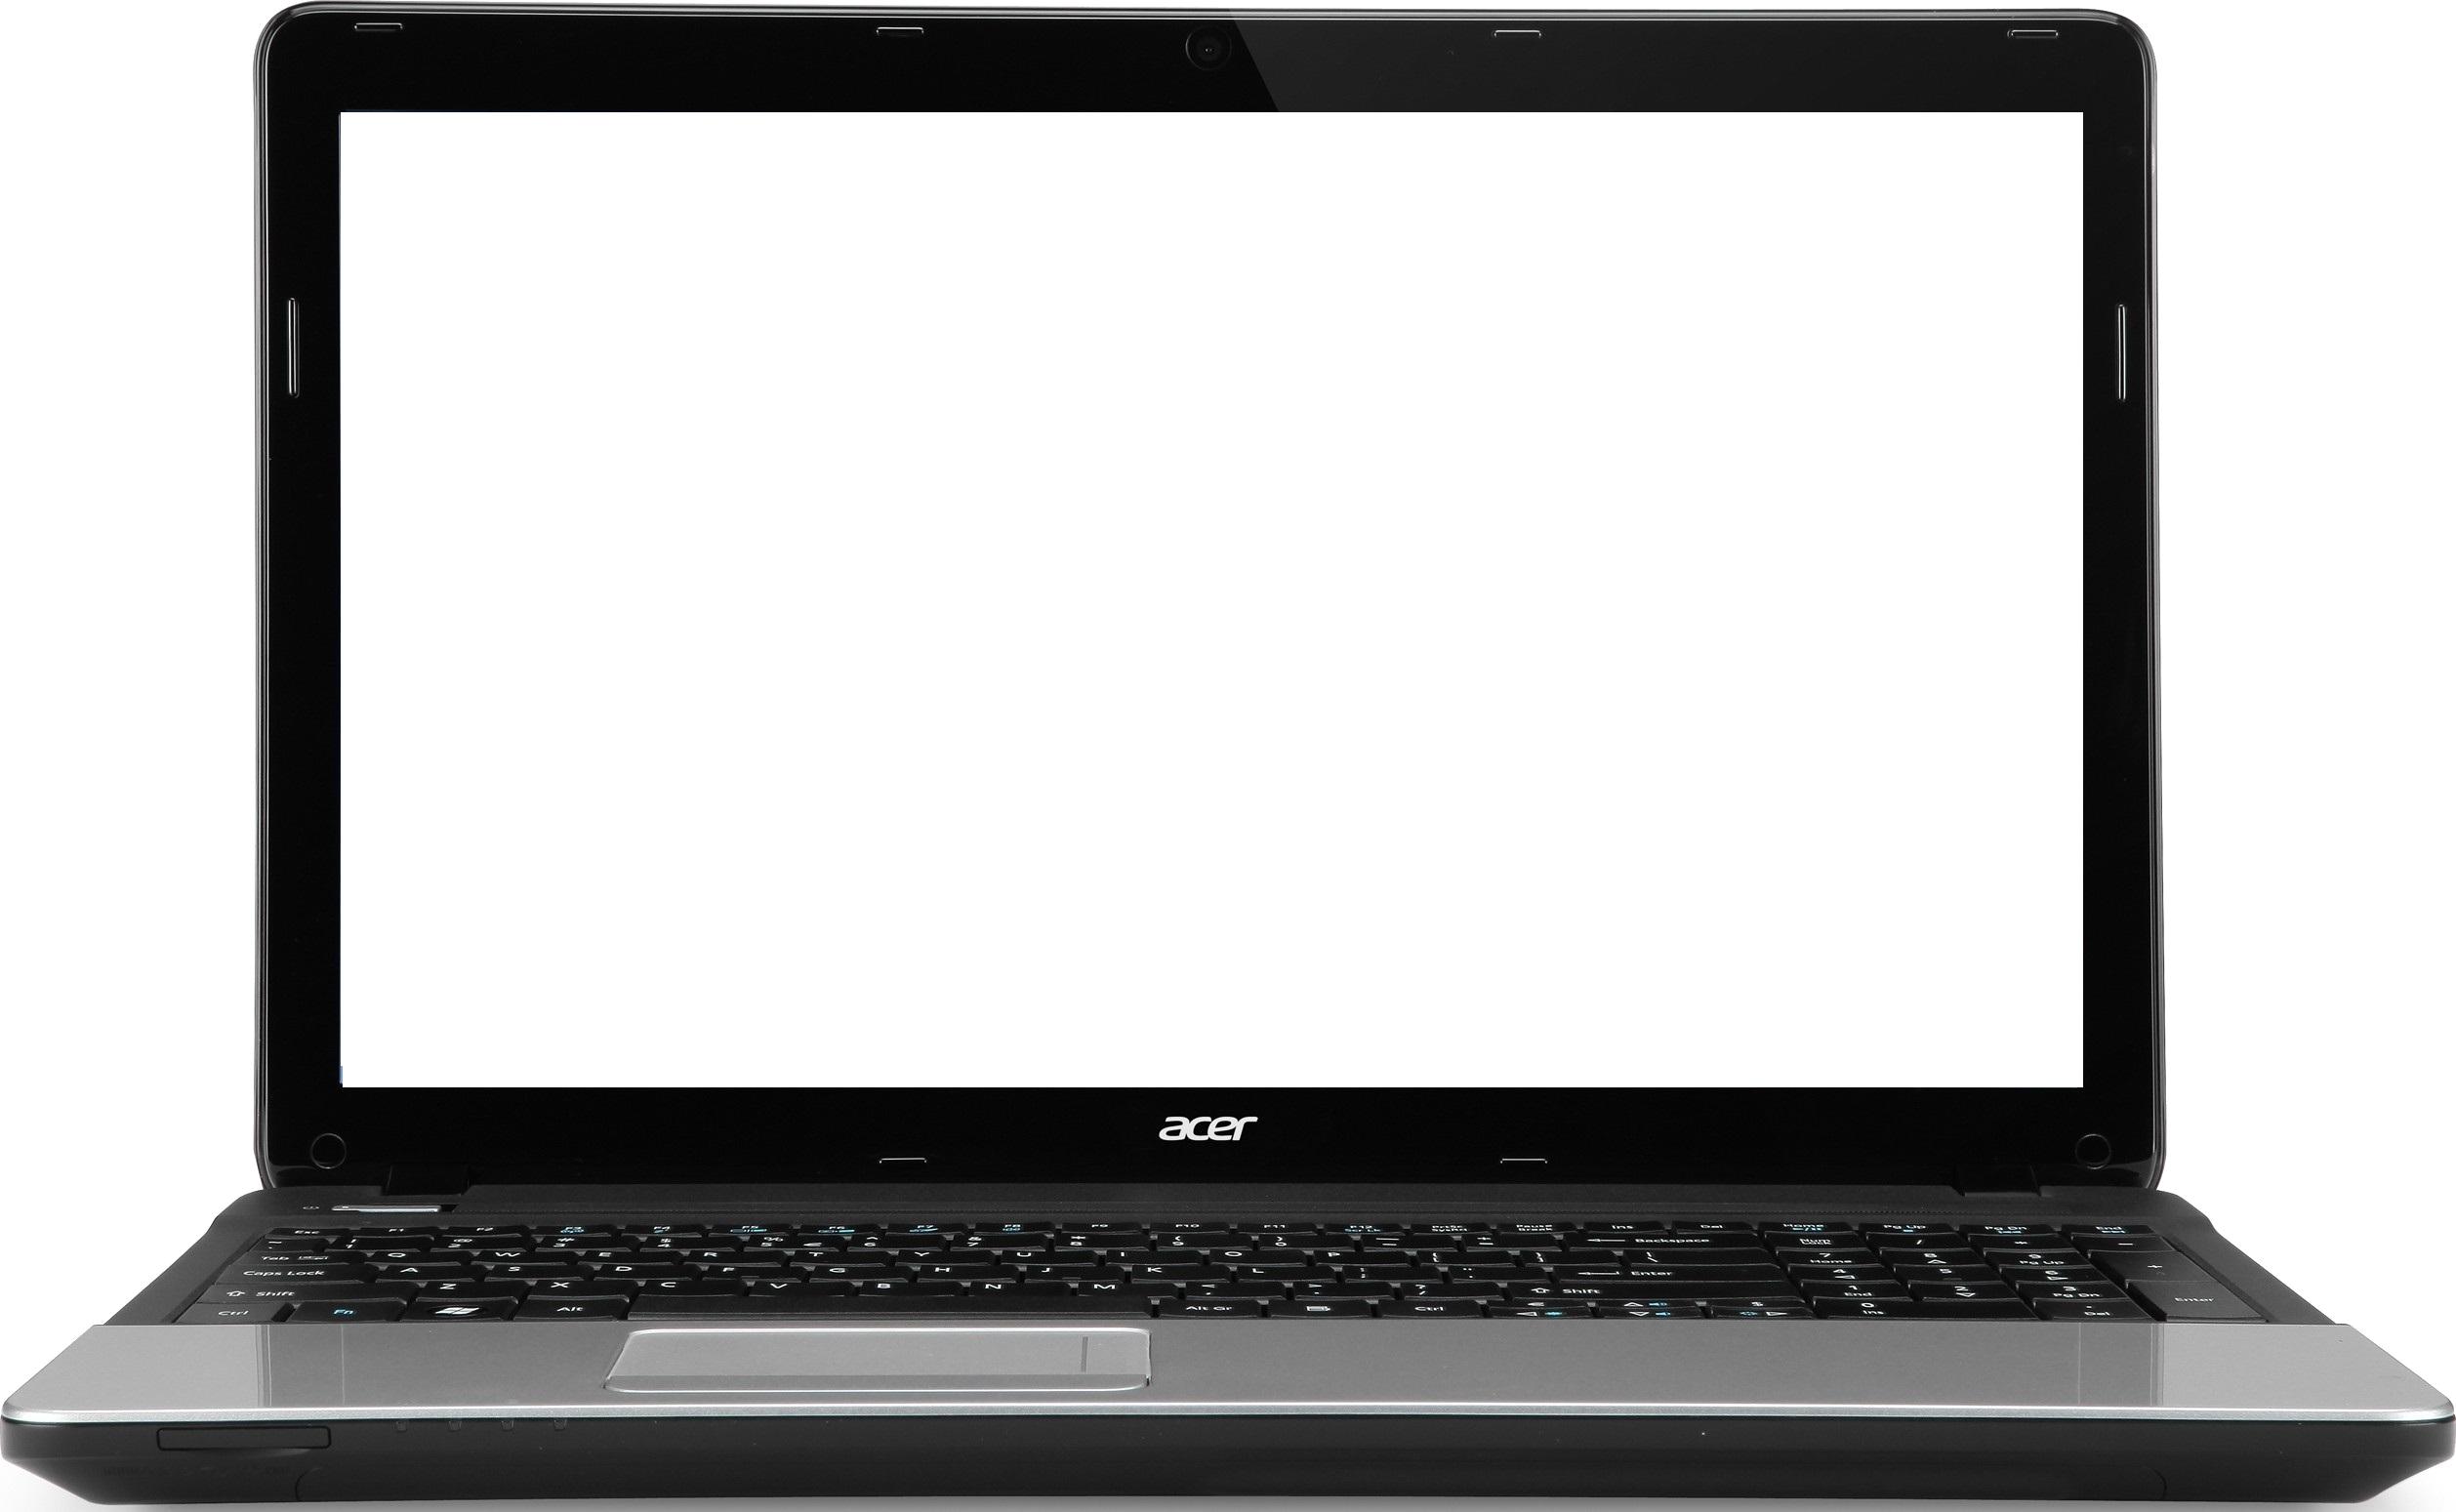 Laptop Png image #6749 - PNG Lap